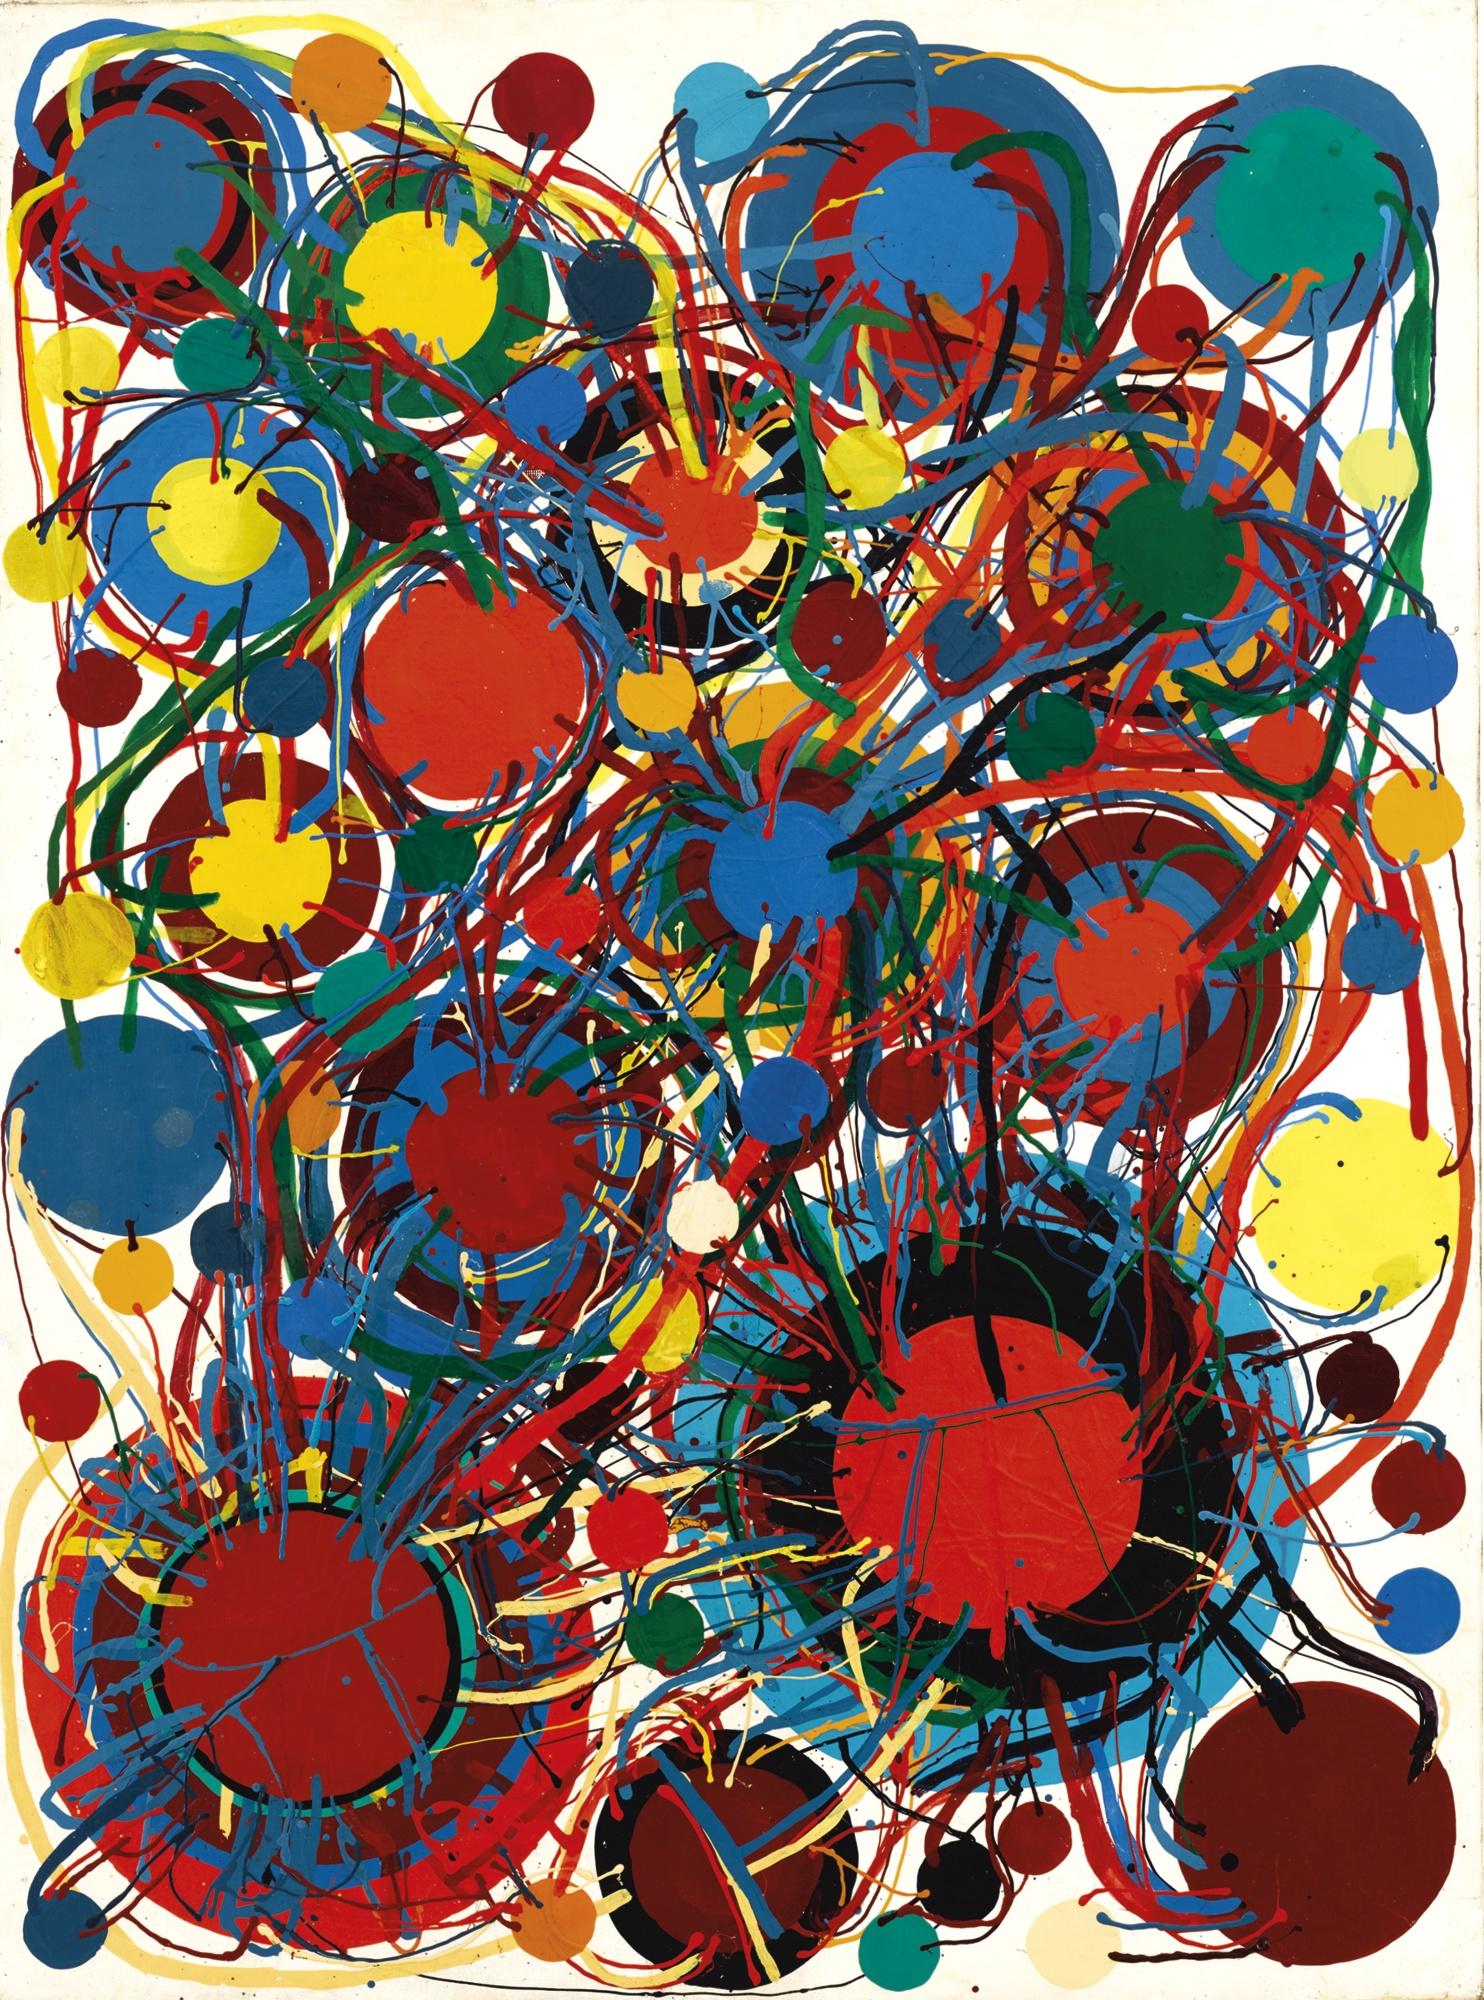 Atsuko Tanaka-Work-1968